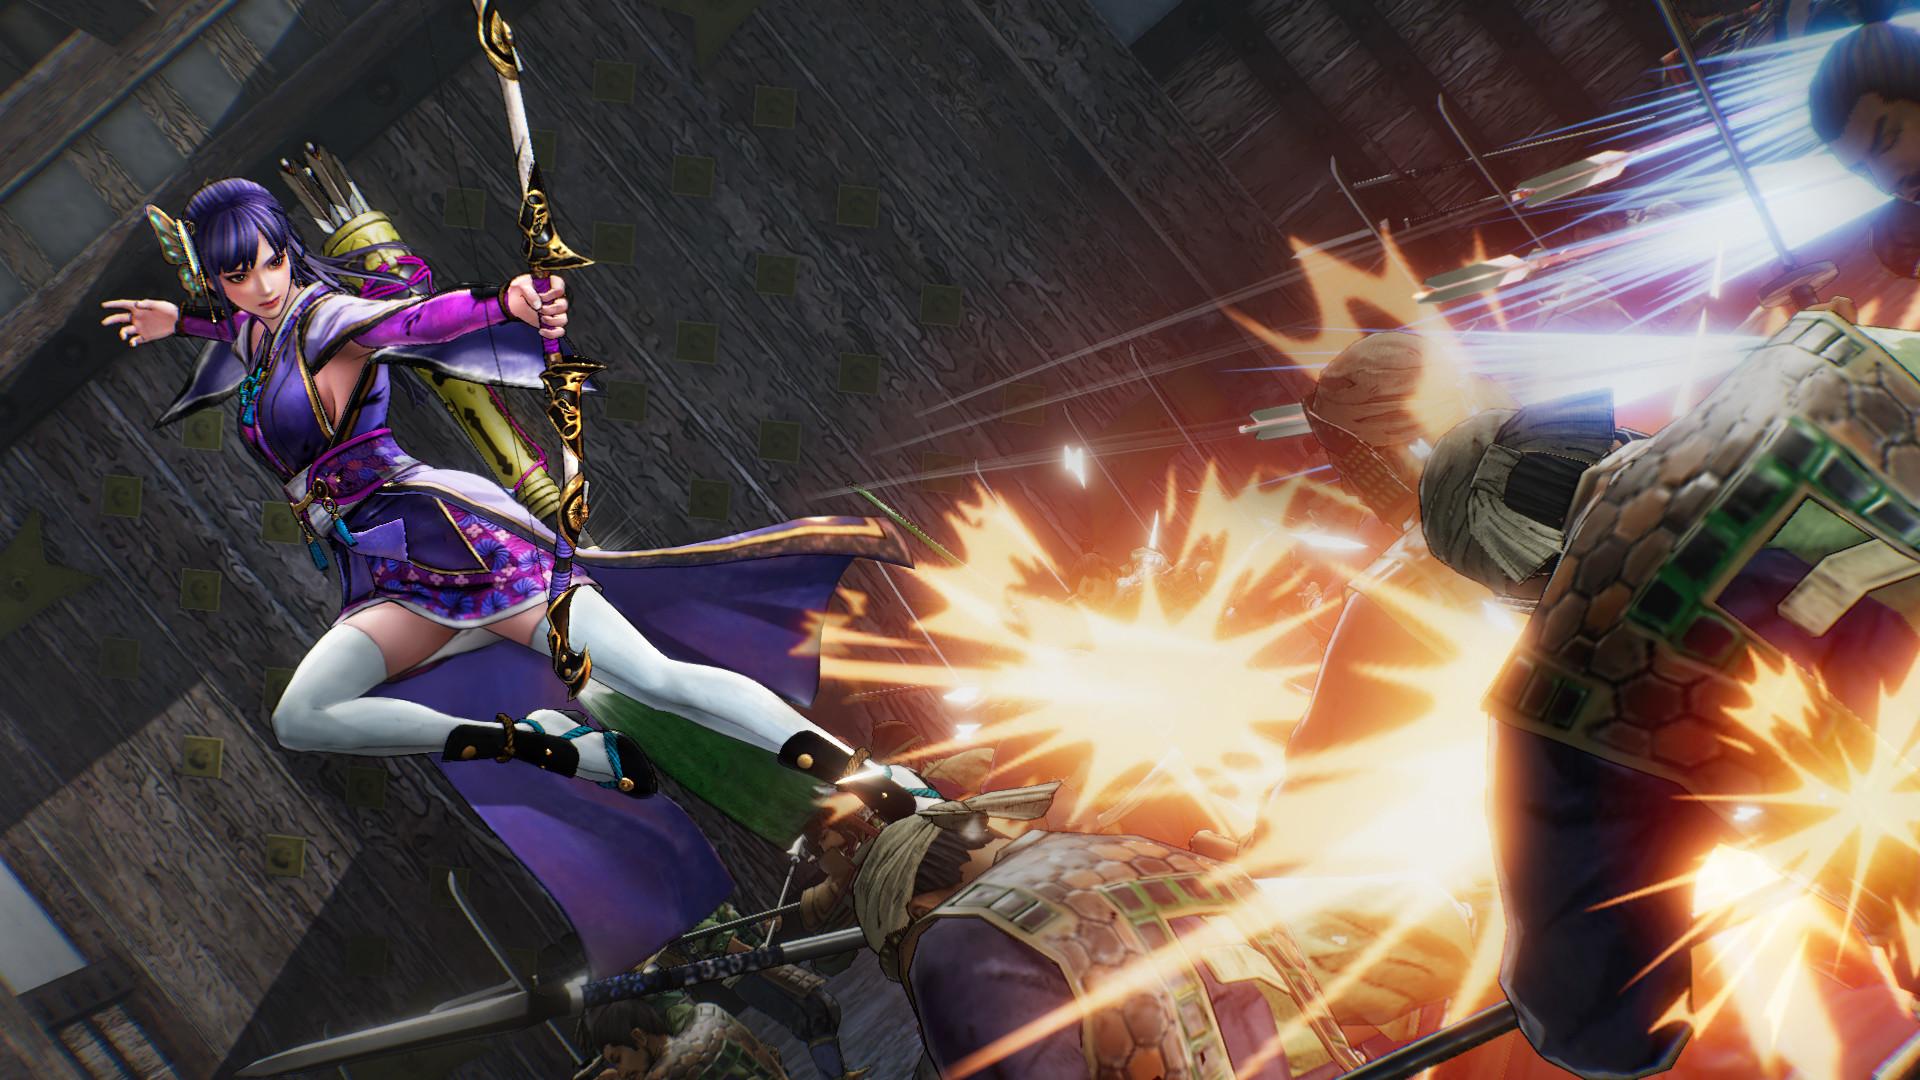 samurai-warriors-5-pc-screenshot-3